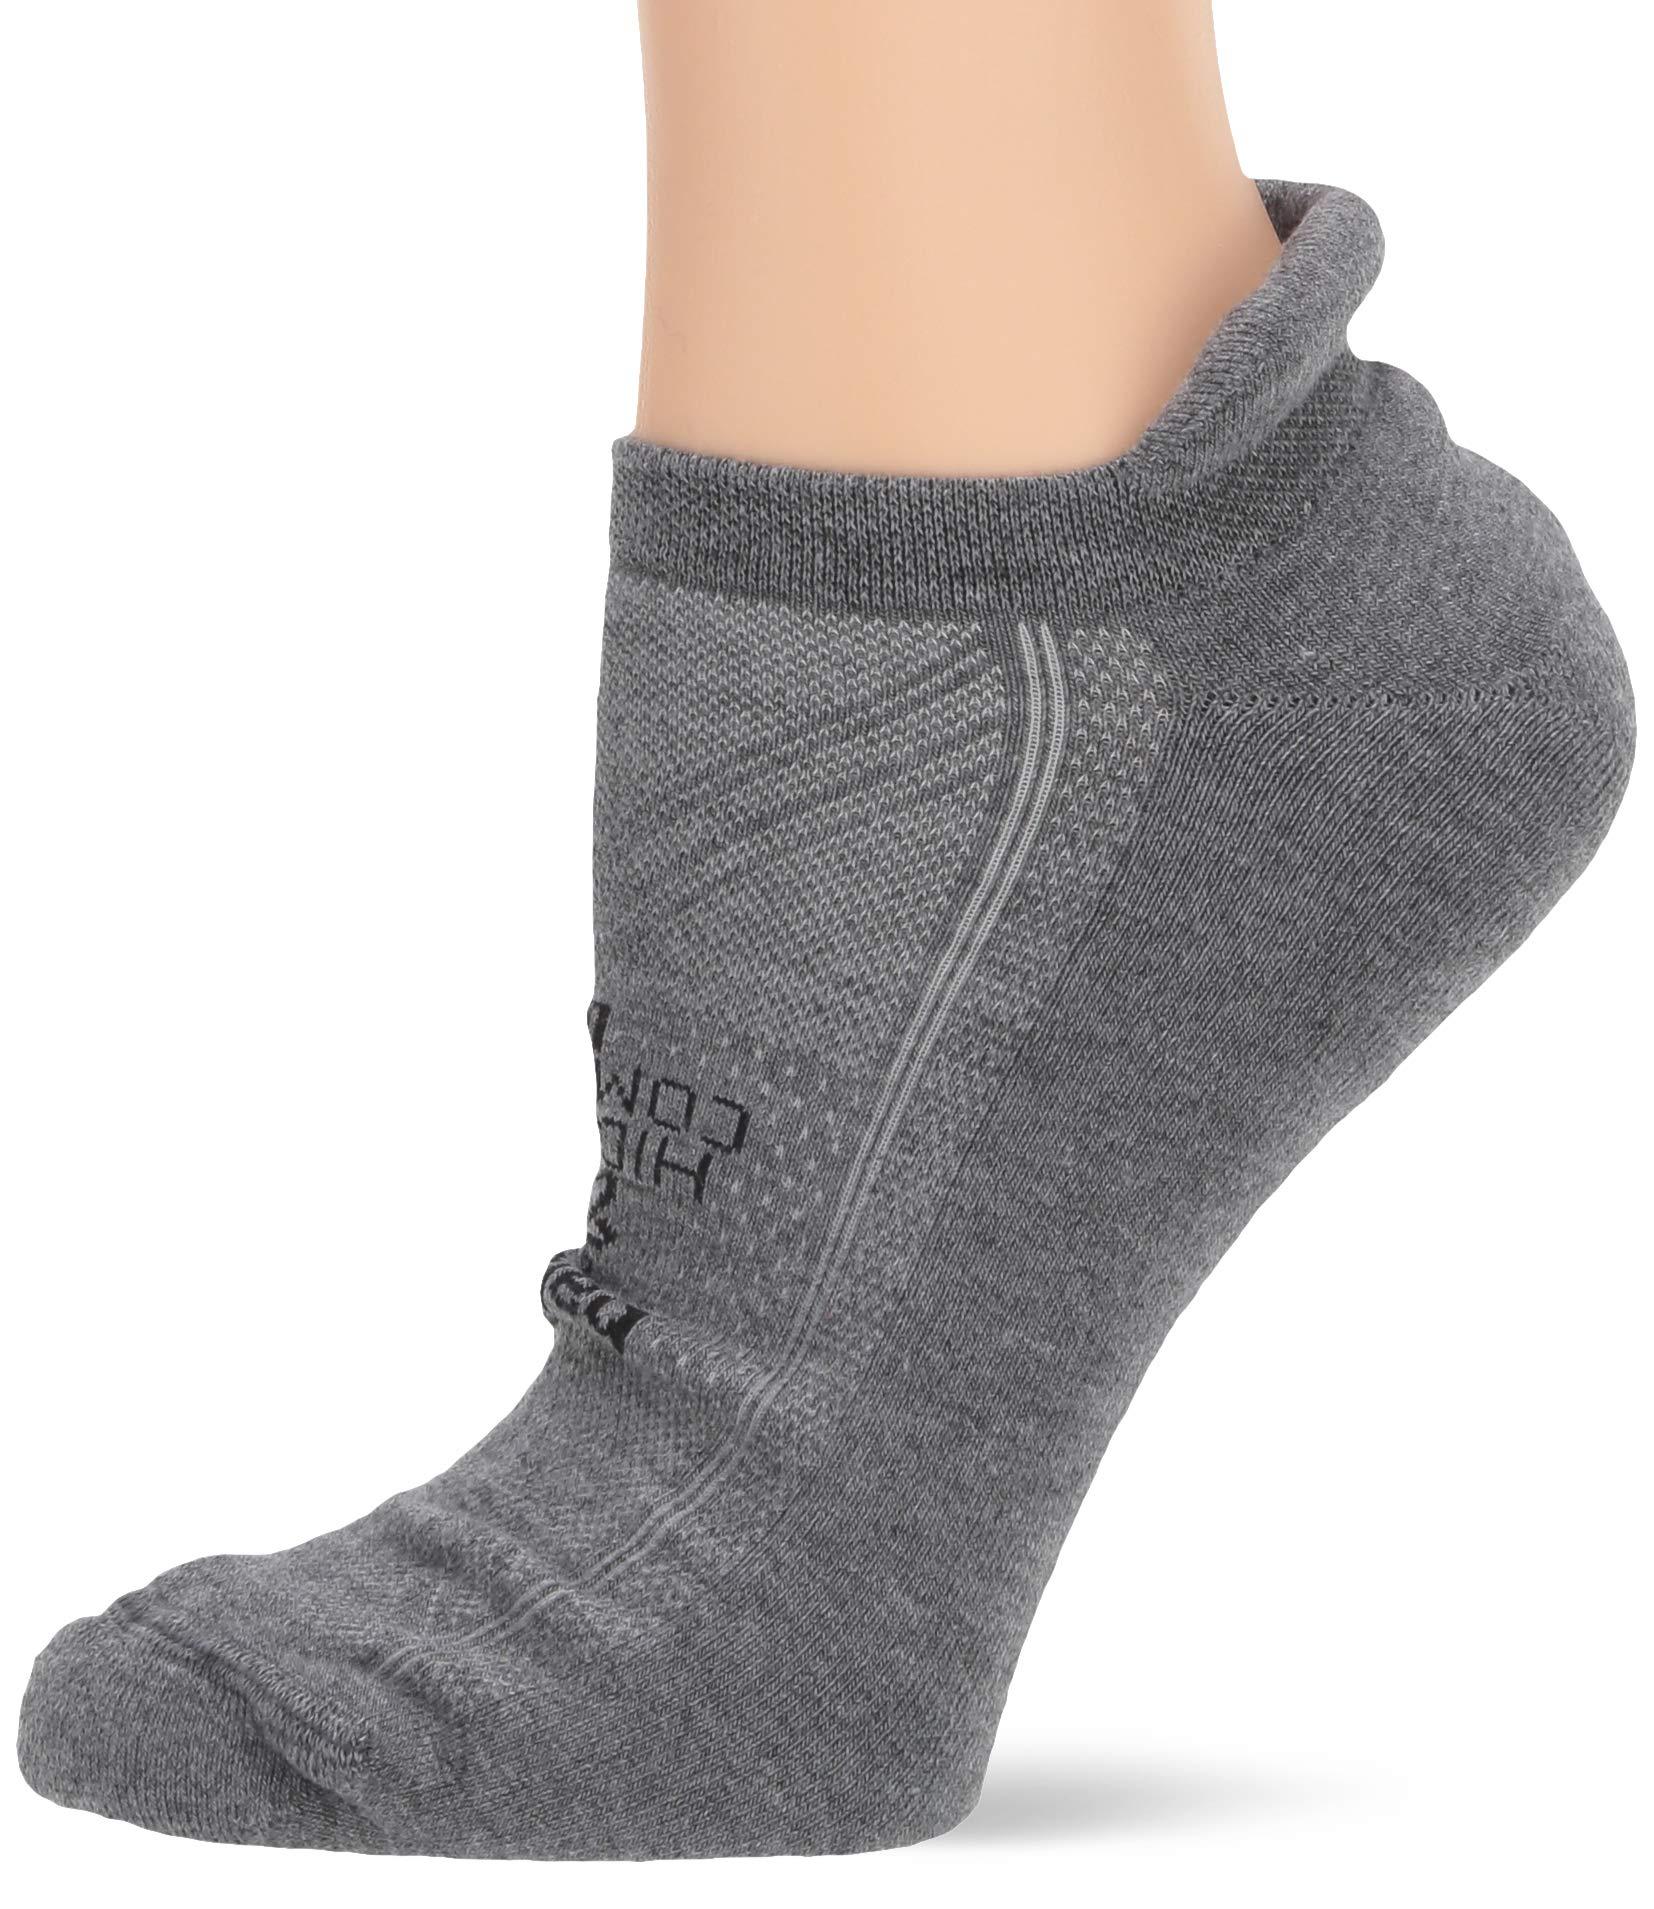 Balega Hidden Comfort No-Show Running Socks for Men and Women (1 Pair), Charcoal, Medium by Balega